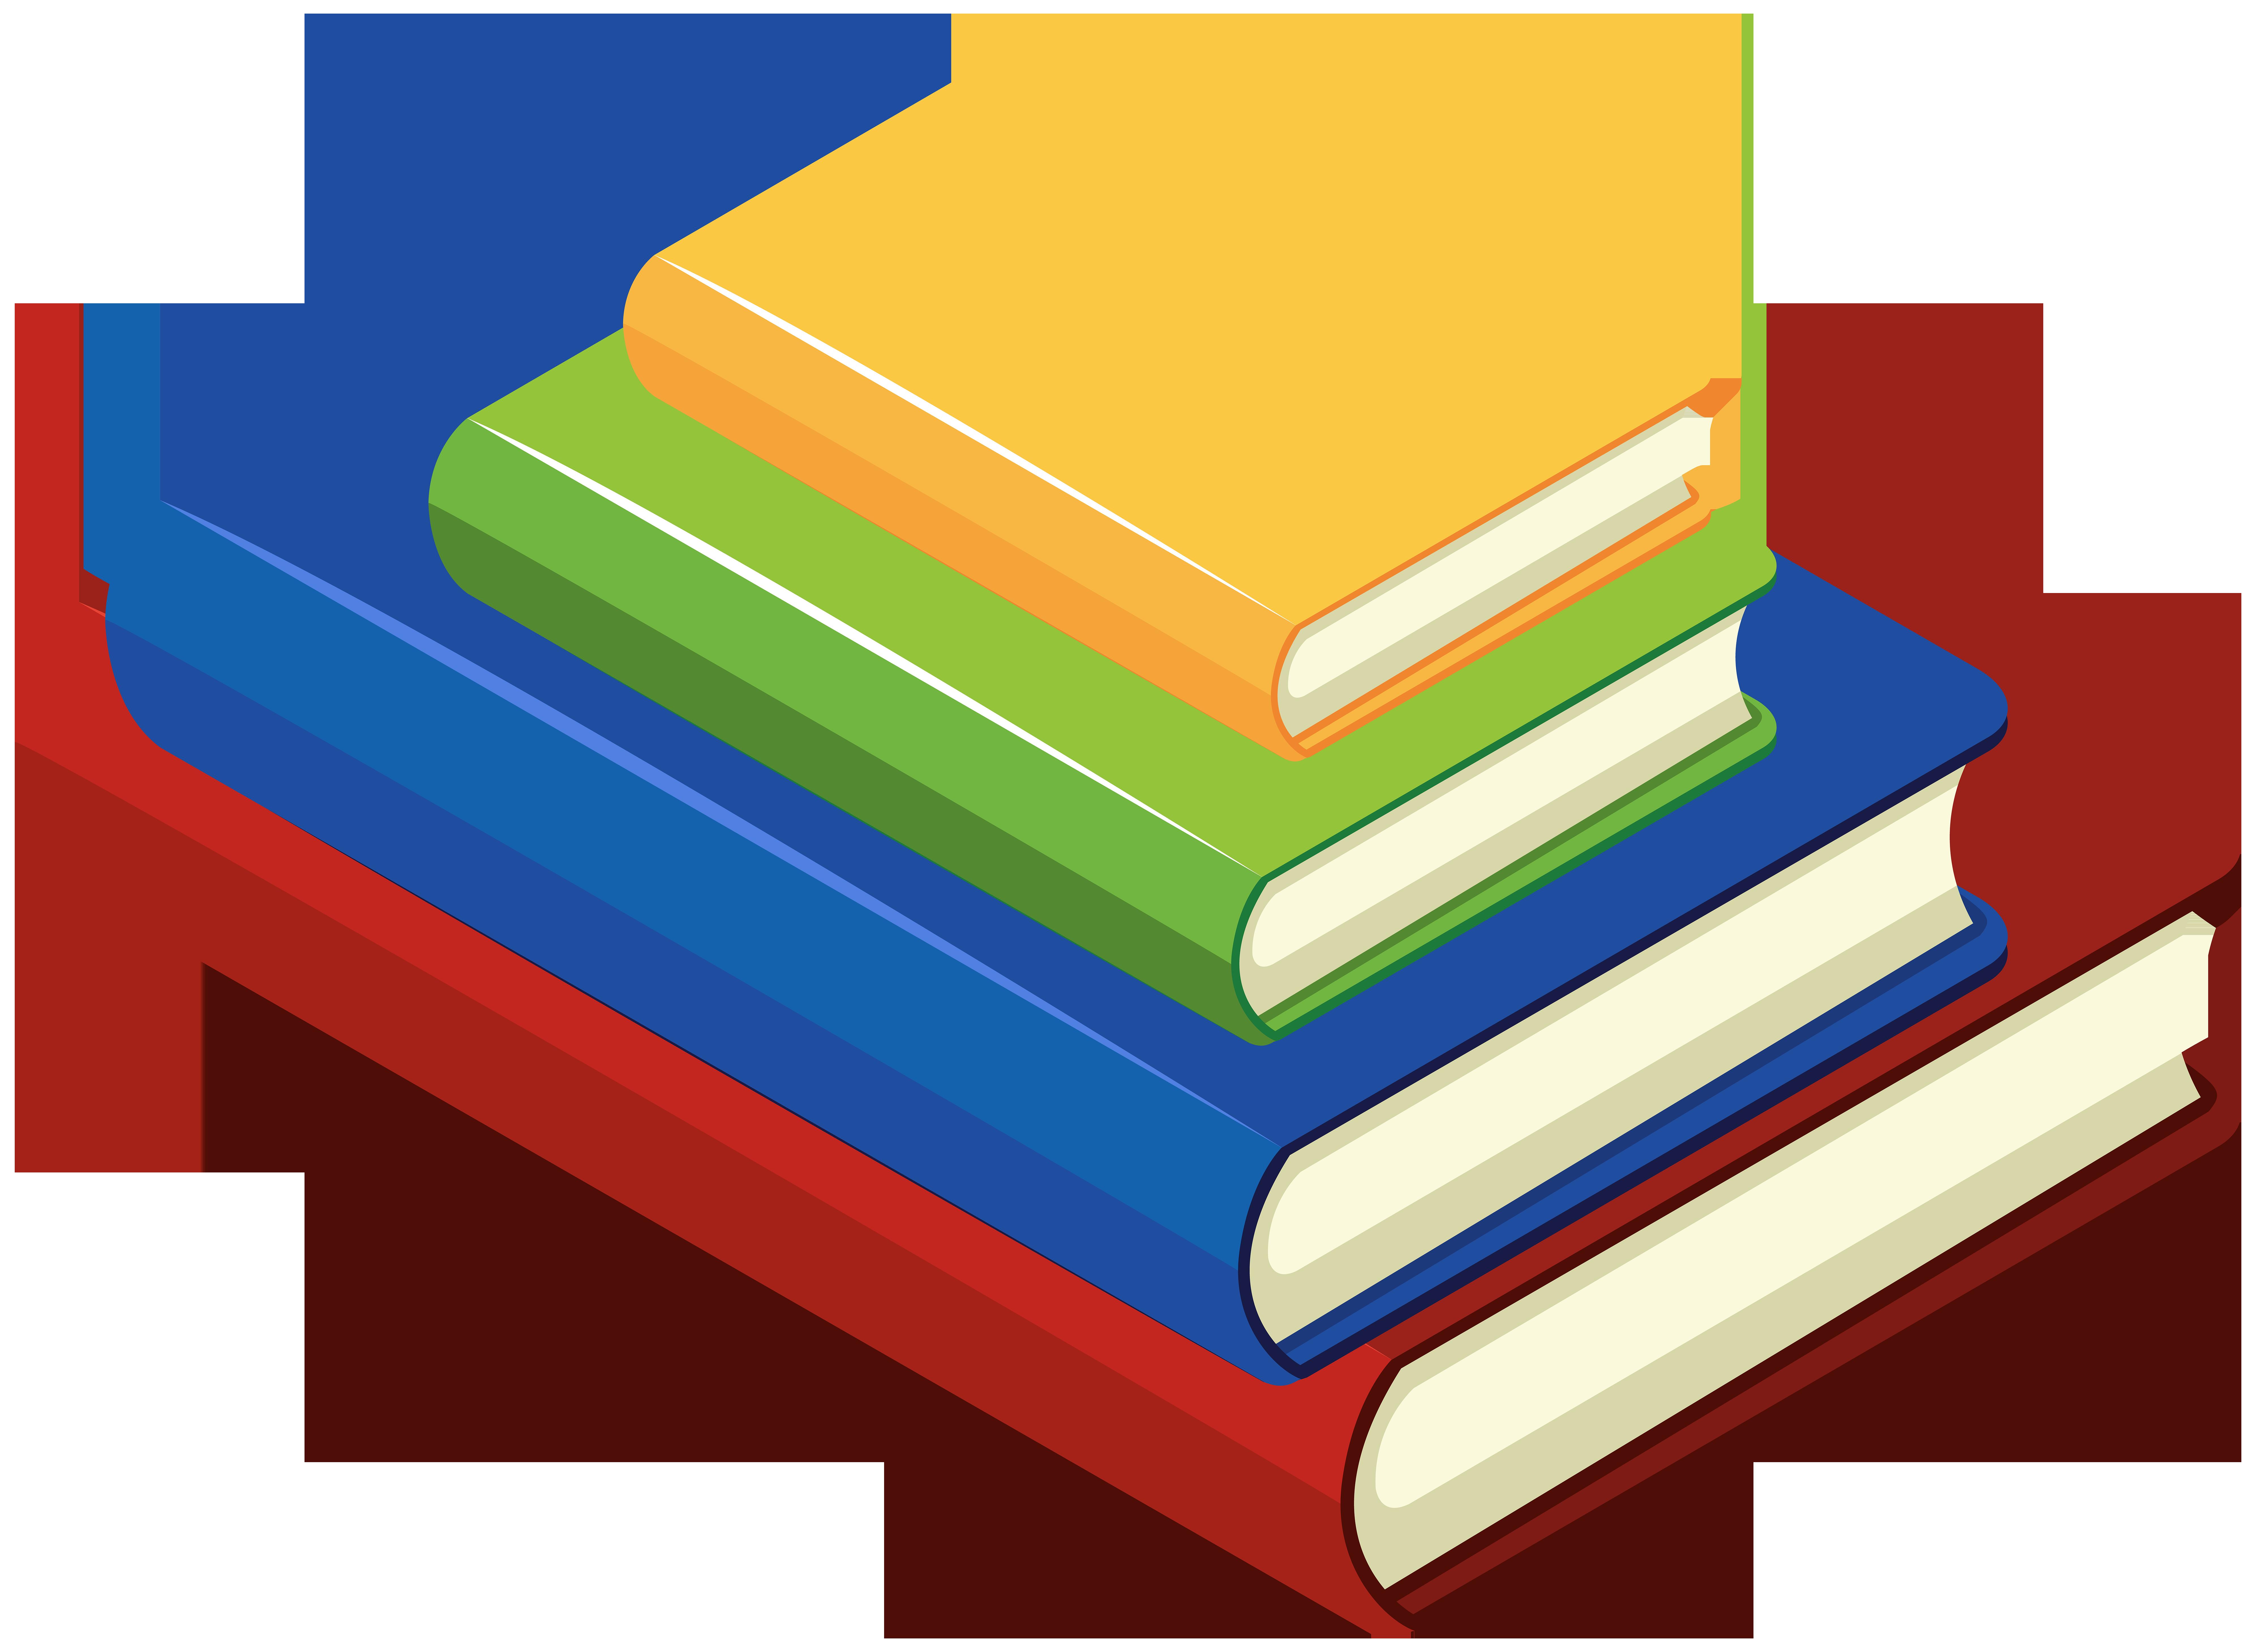 Clipart book rectangular. Books transparent image gallery